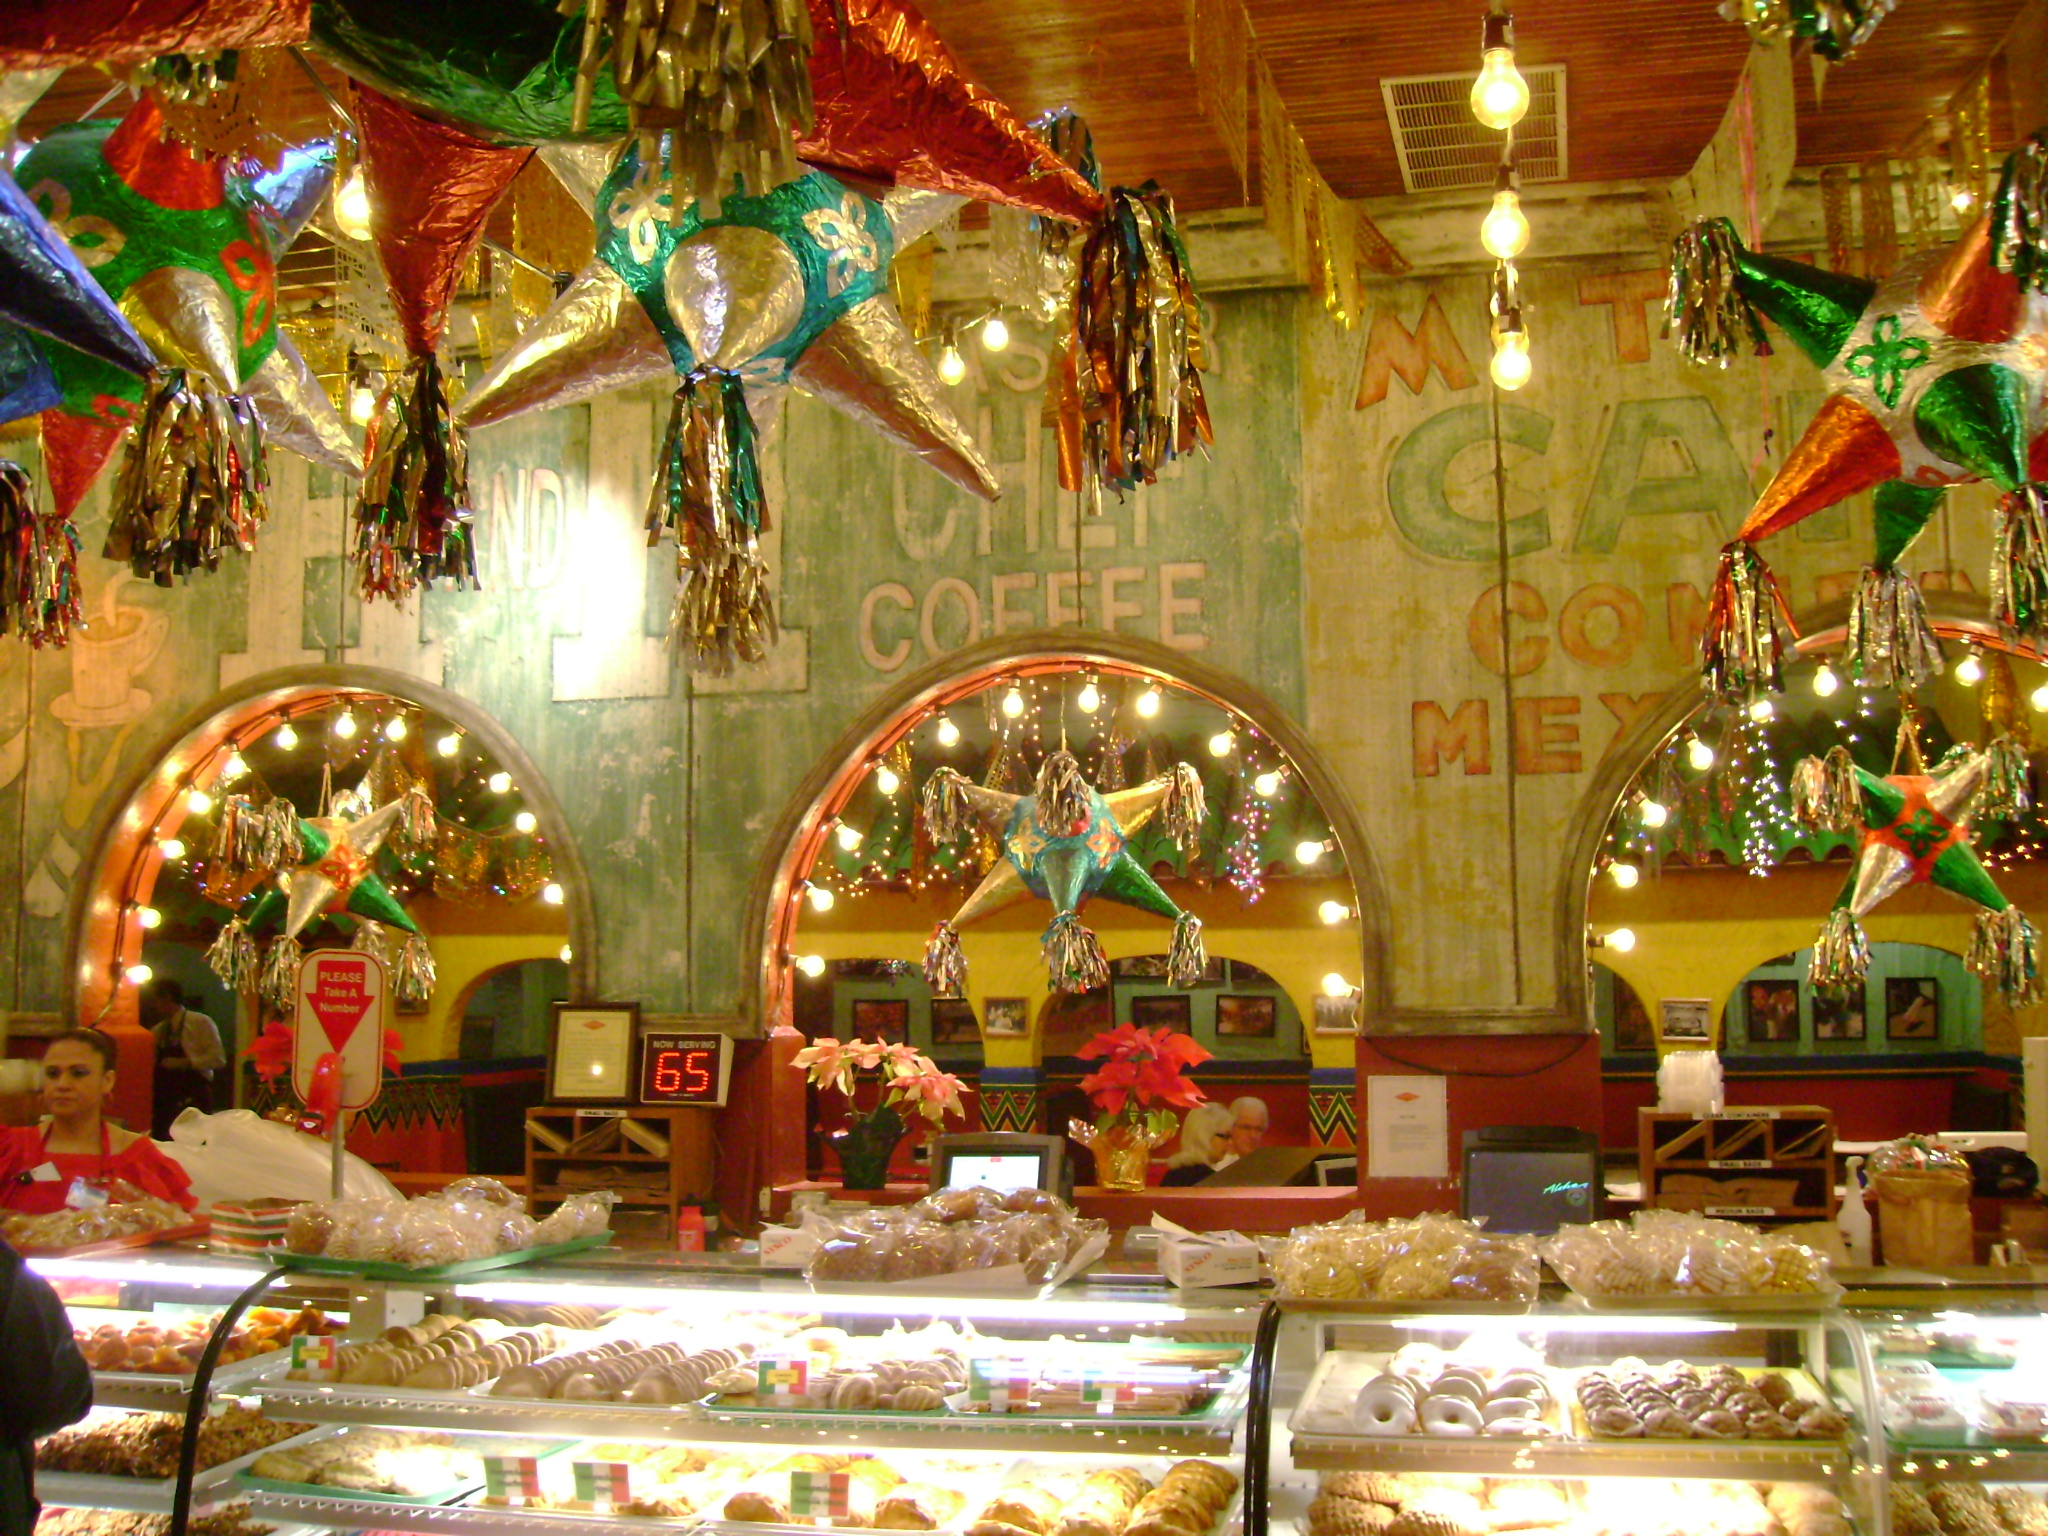 Mi Tierra Mexican Restaurant Airway Drive Santa Rosa Ca